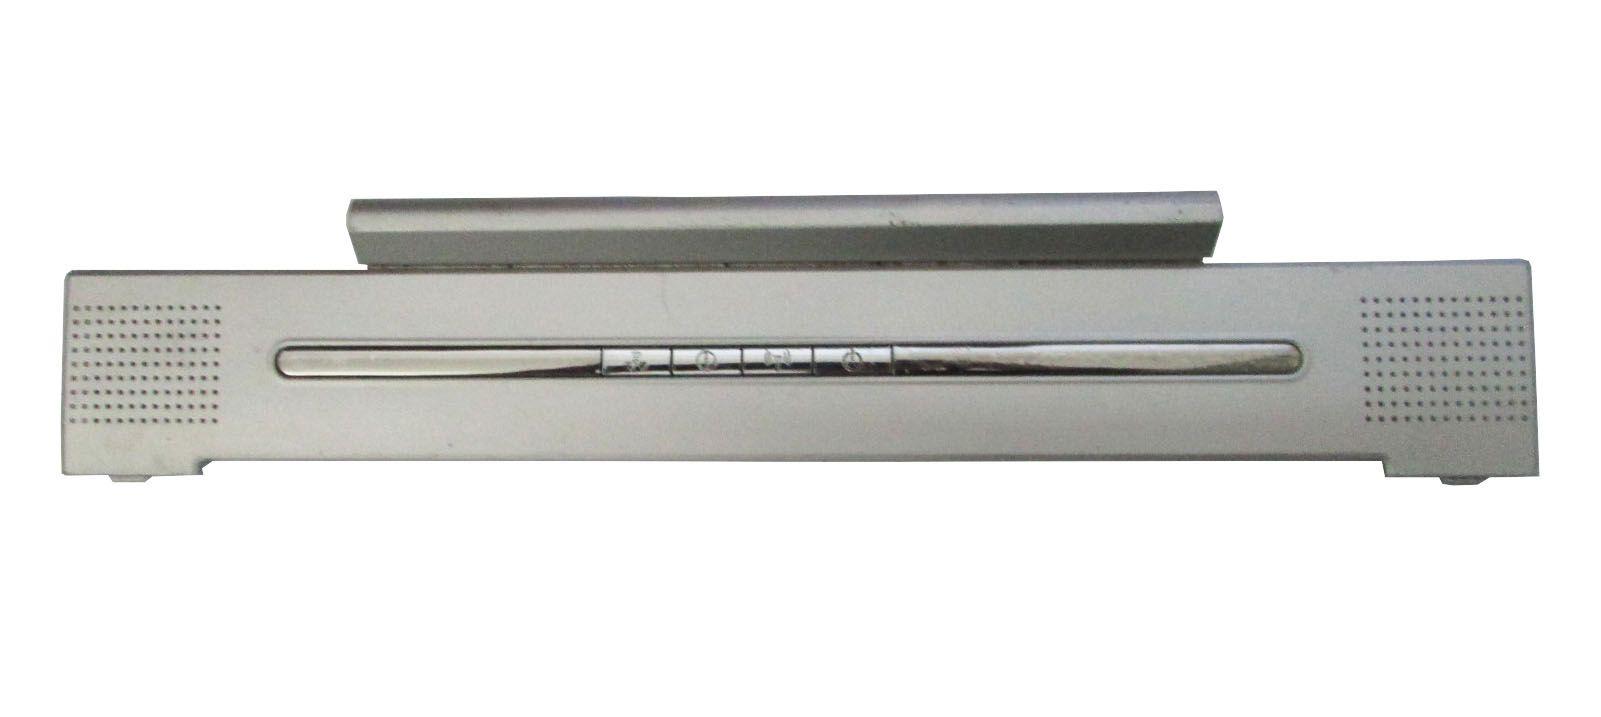 Régua Power P/ Notebook Itautec W7645 P/N: 80-41117c10 (semi novo)